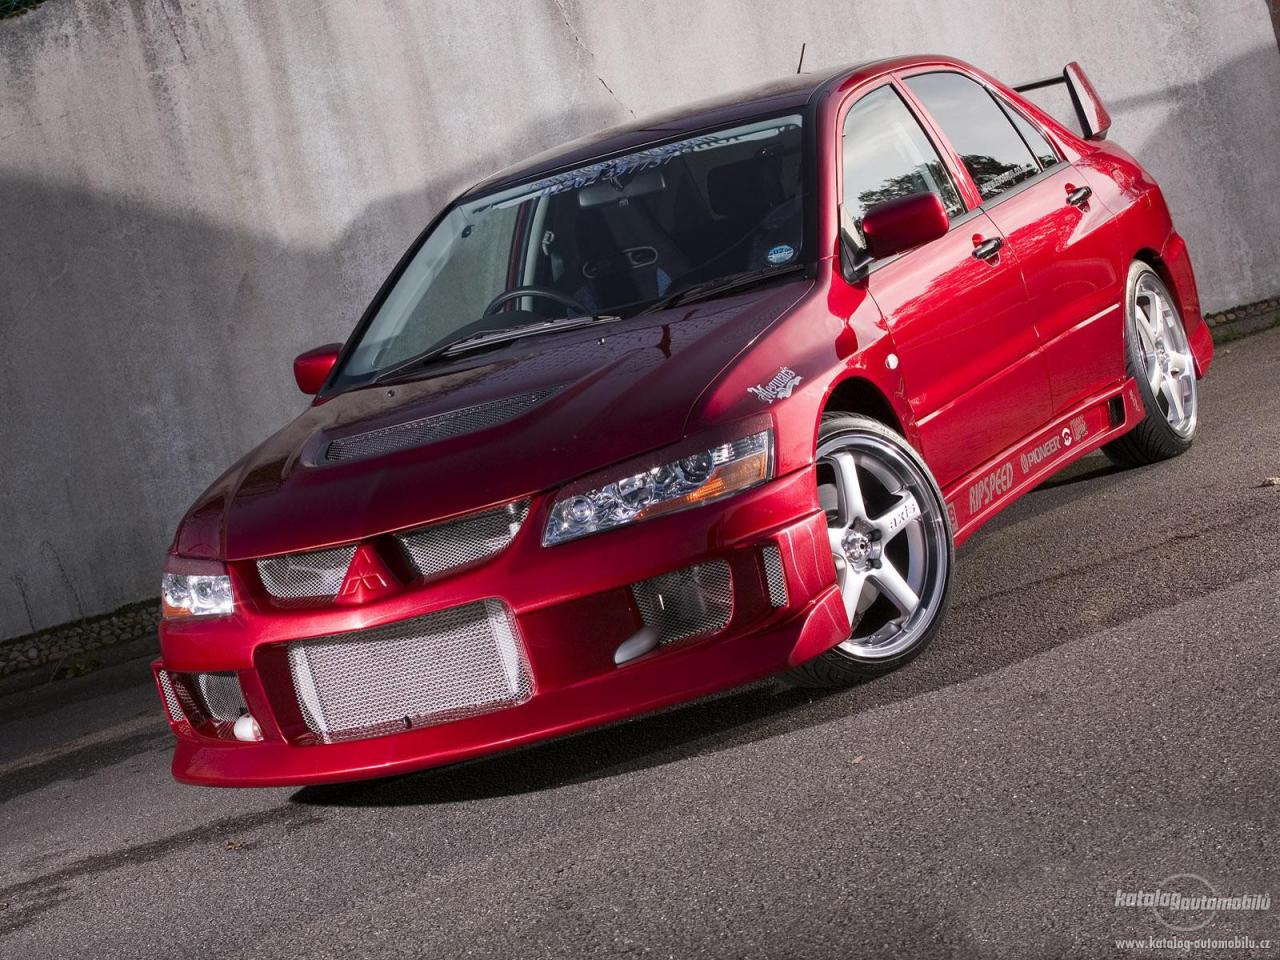 Mitsubishi lancer 2004 отзыв владельца дата публикации: 02032016